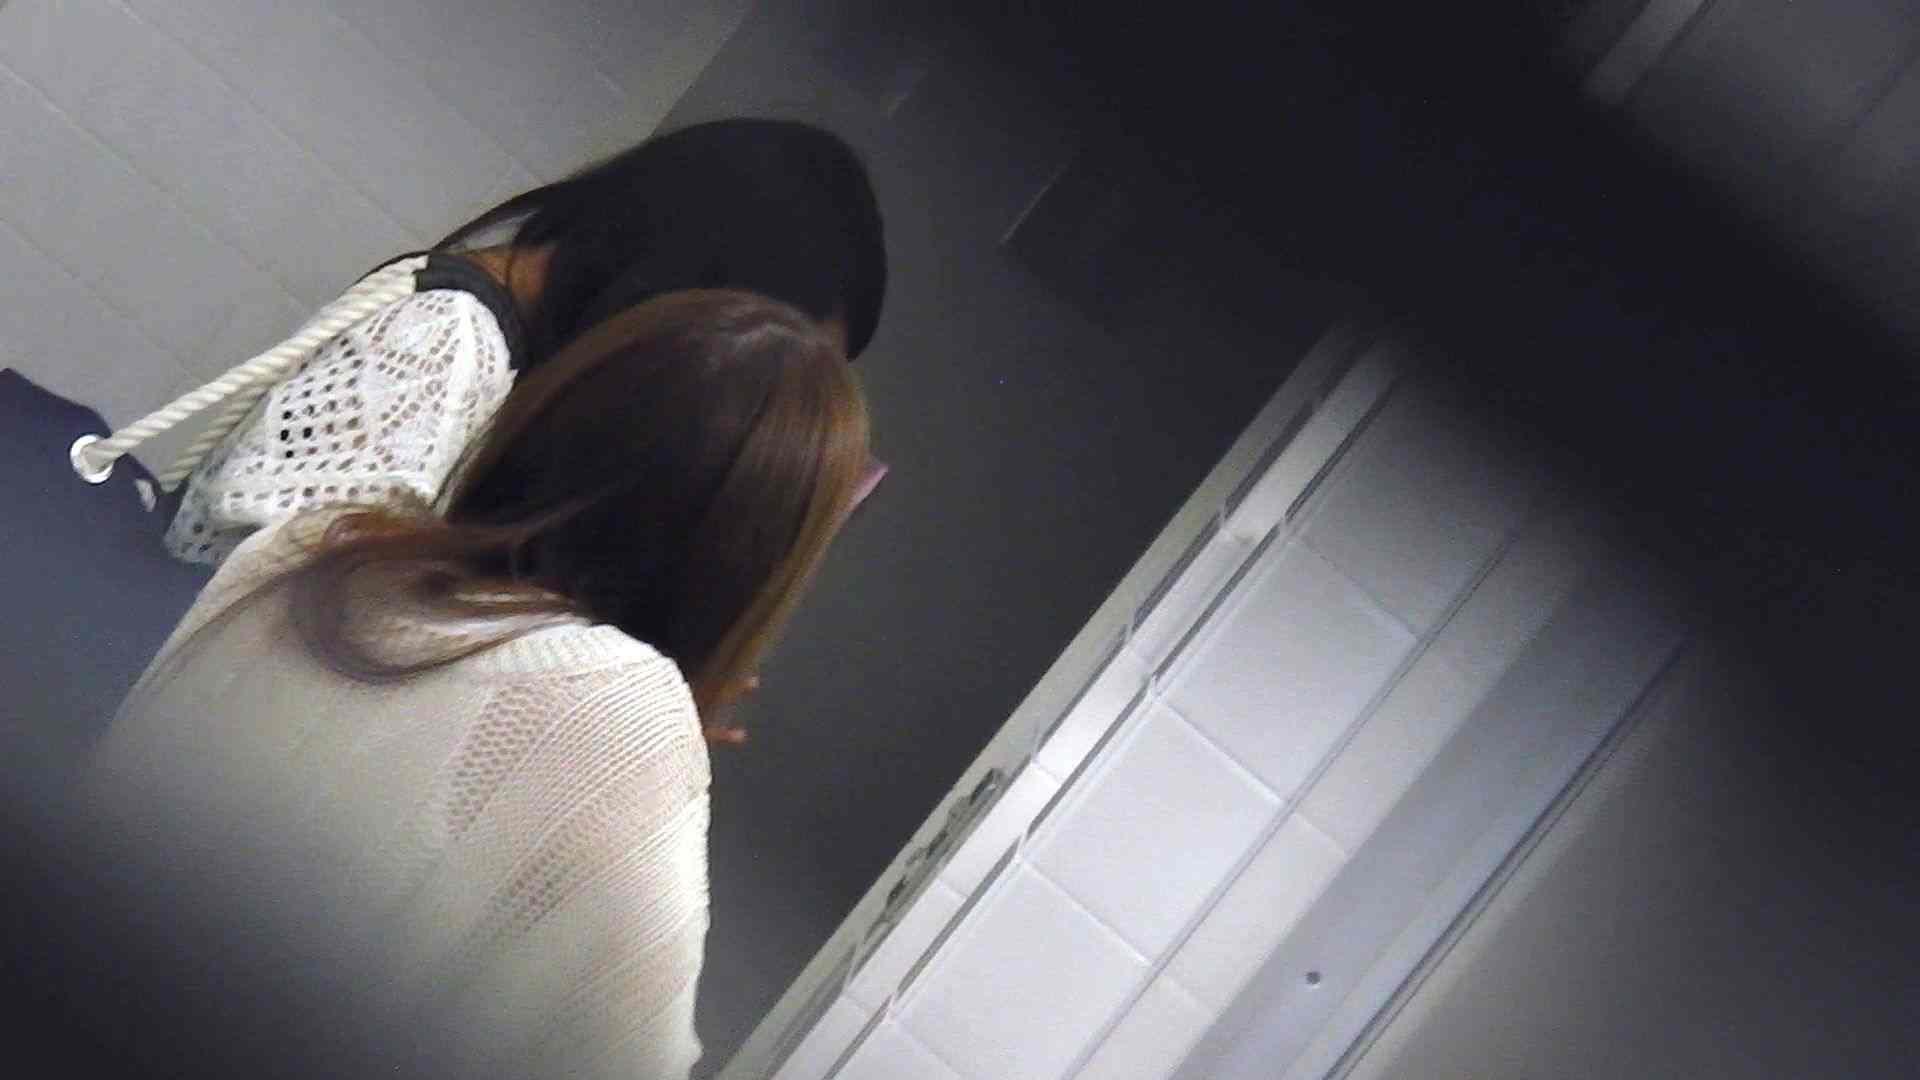 vol.03 命がけ潜伏洗面所! 薄毛がたまりません。 プライベート 盗撮動画紹介 86連発 77